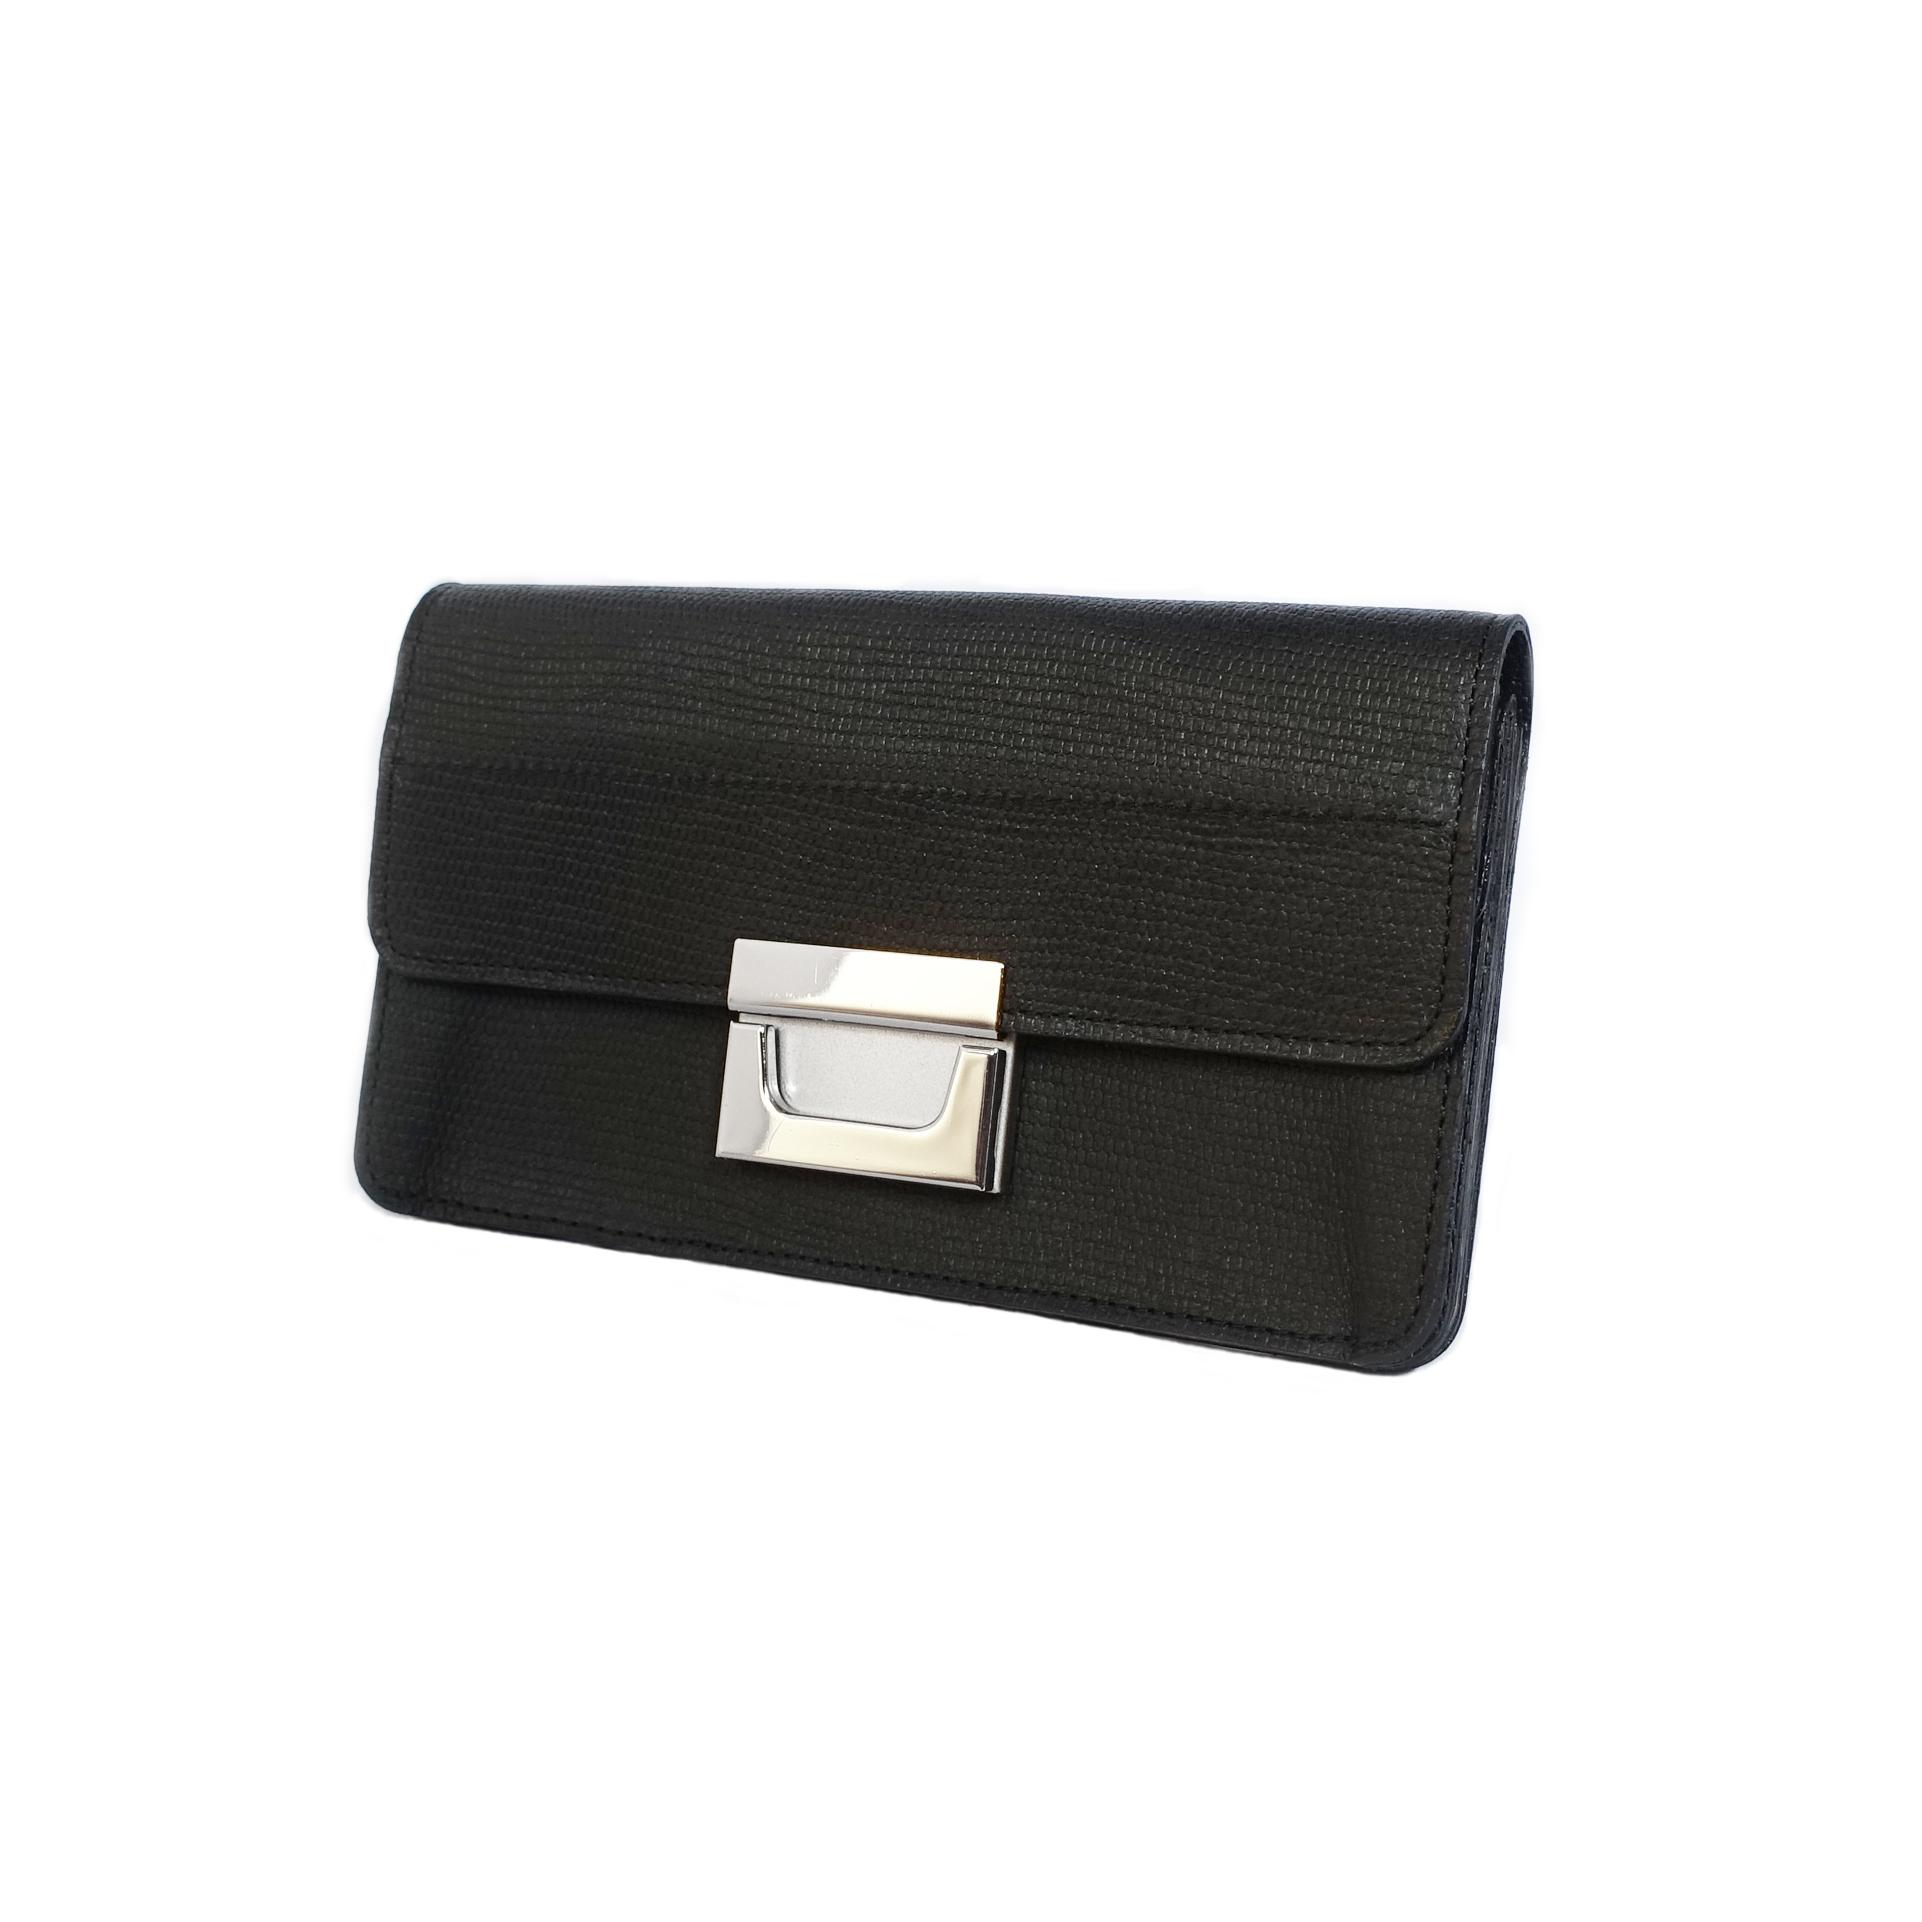 ■Garcon Long Wallet■ギャルソンタイプ長財布(ブラック)